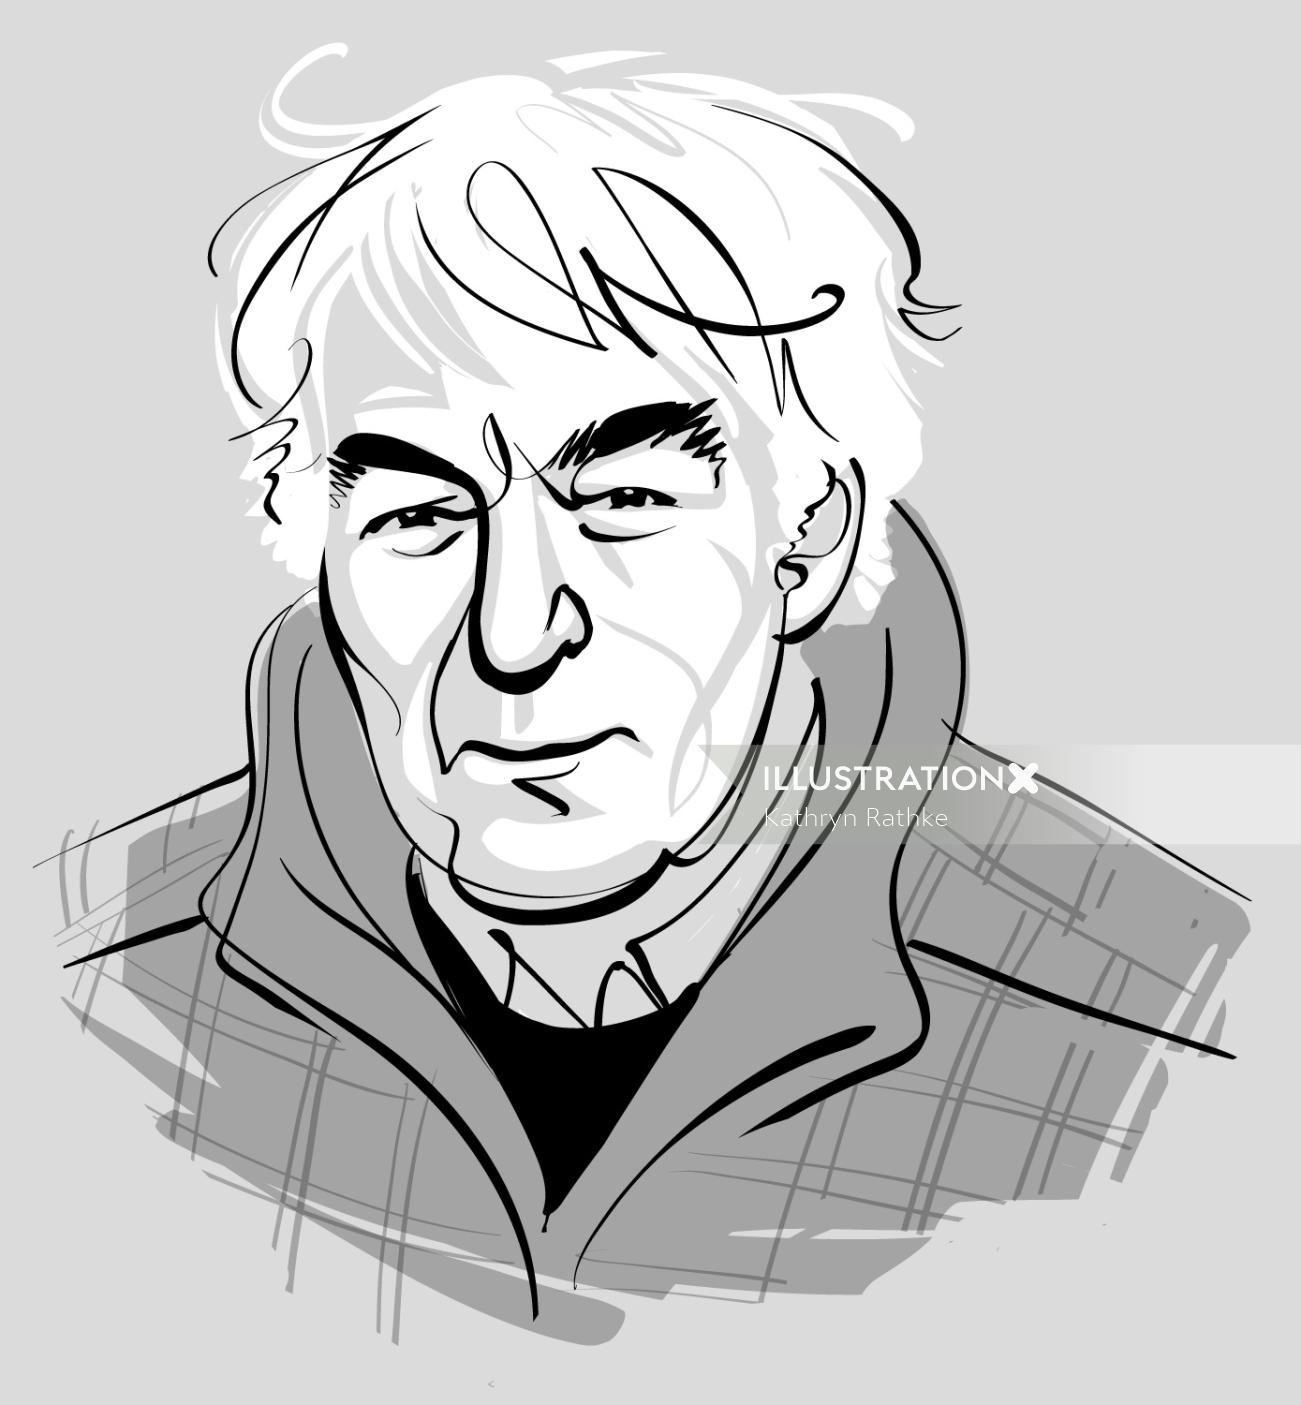 Black & White Portrait of Seamus Heaney